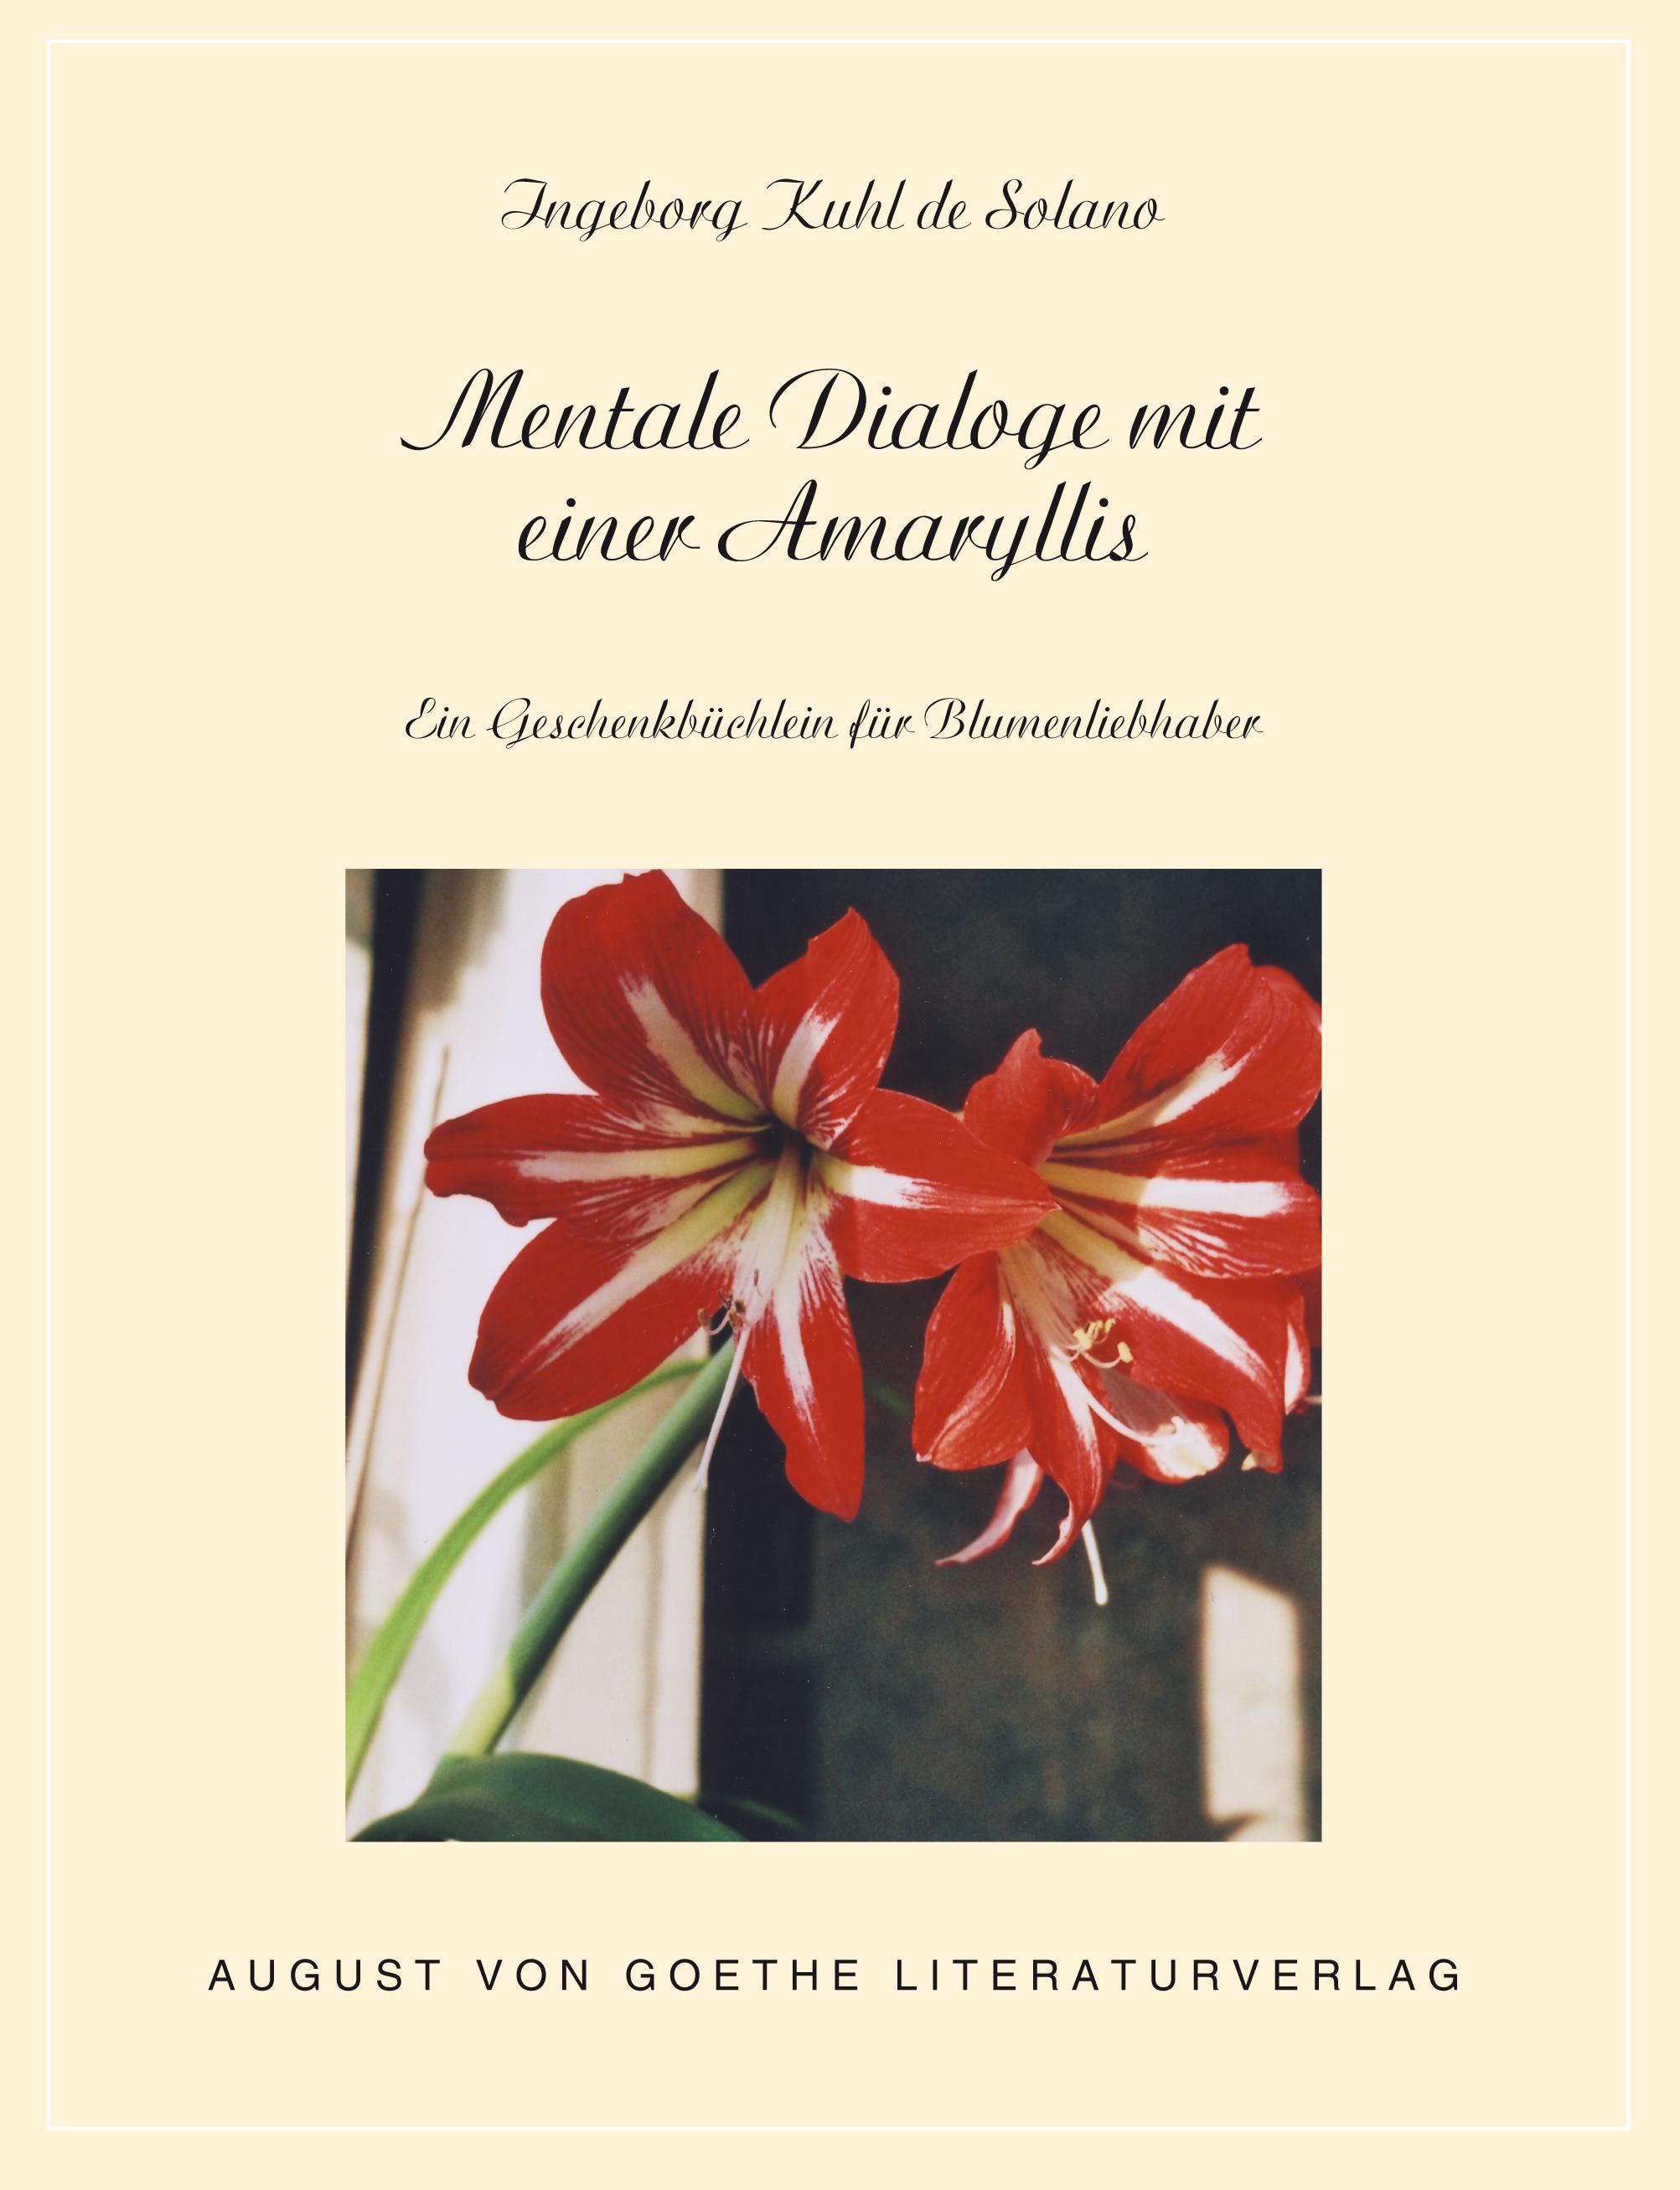 Mentale-Dialoge-mit-einer-Amaryllis-Ingeborg-Kuhl-de-Solano